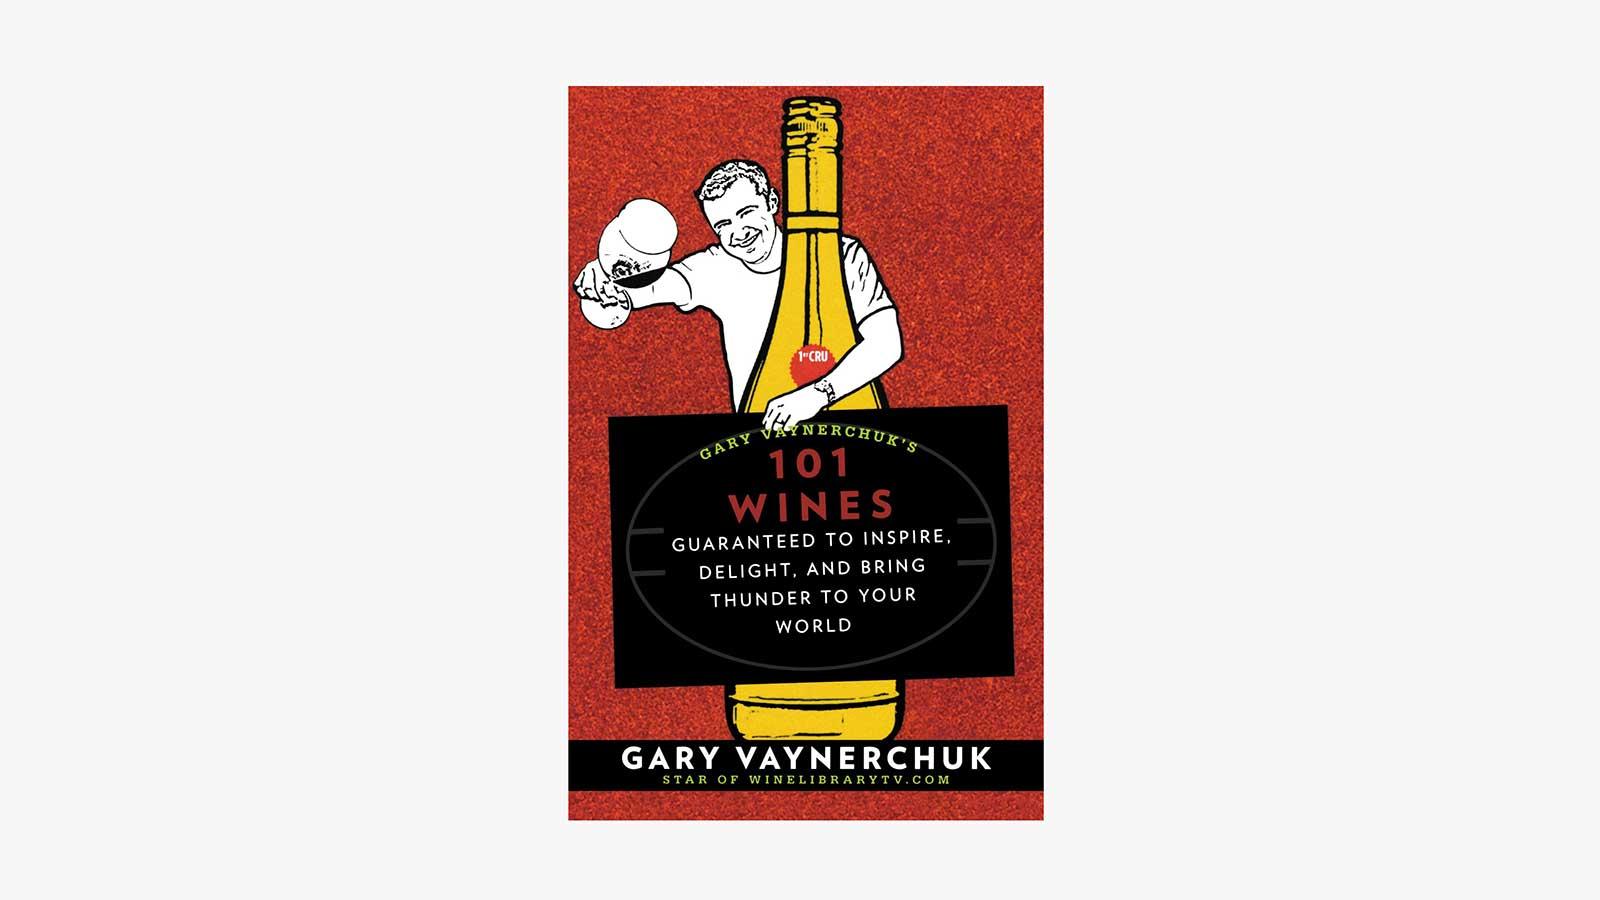 Gary Vaynerchuks 101 Wines